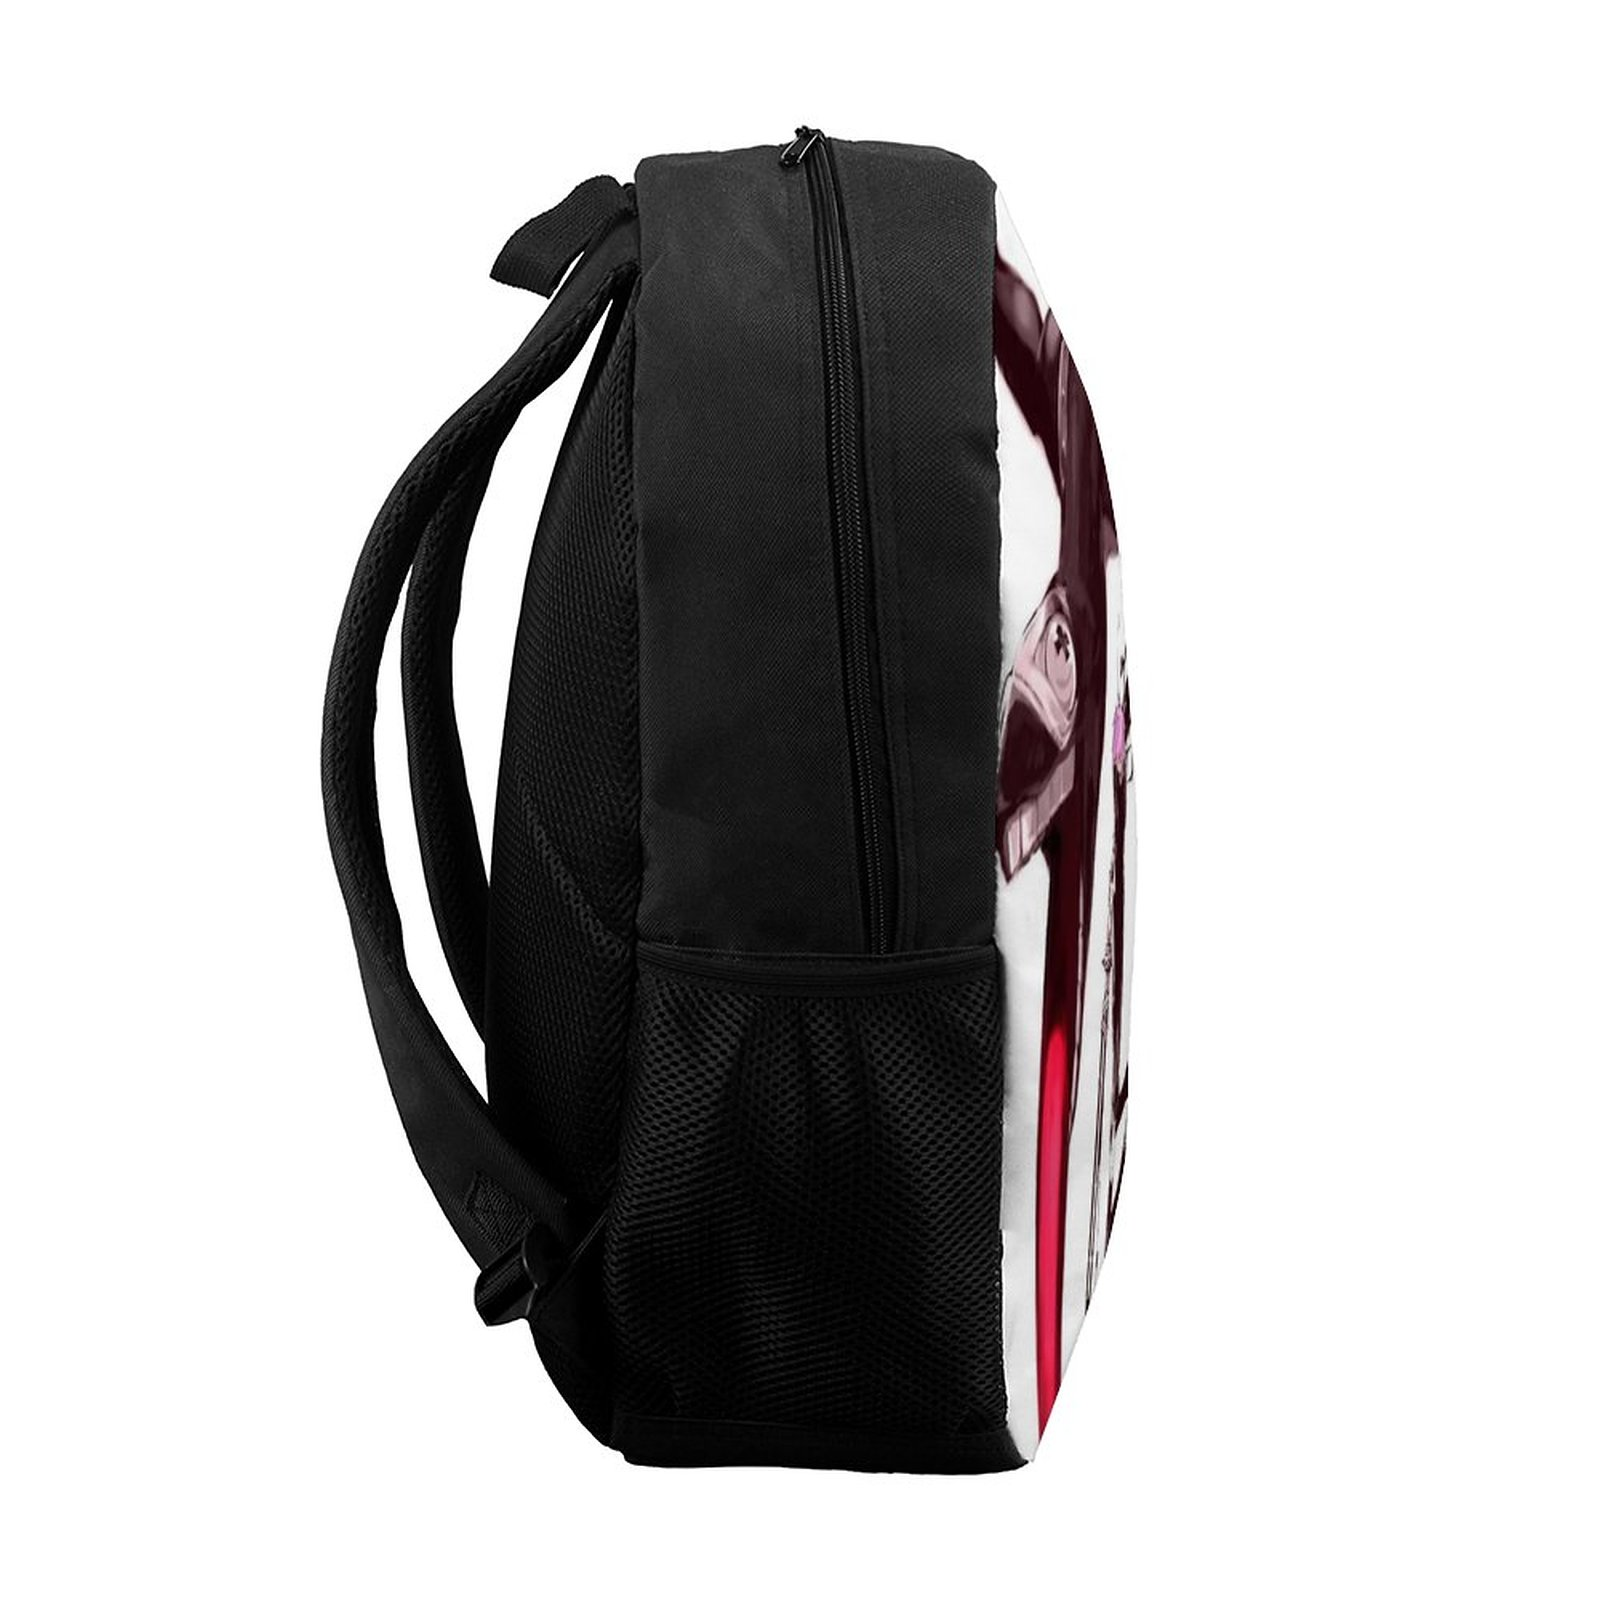 H807eb0925bda4cfa9ed20b6490c5269bO - Anime Backpacks